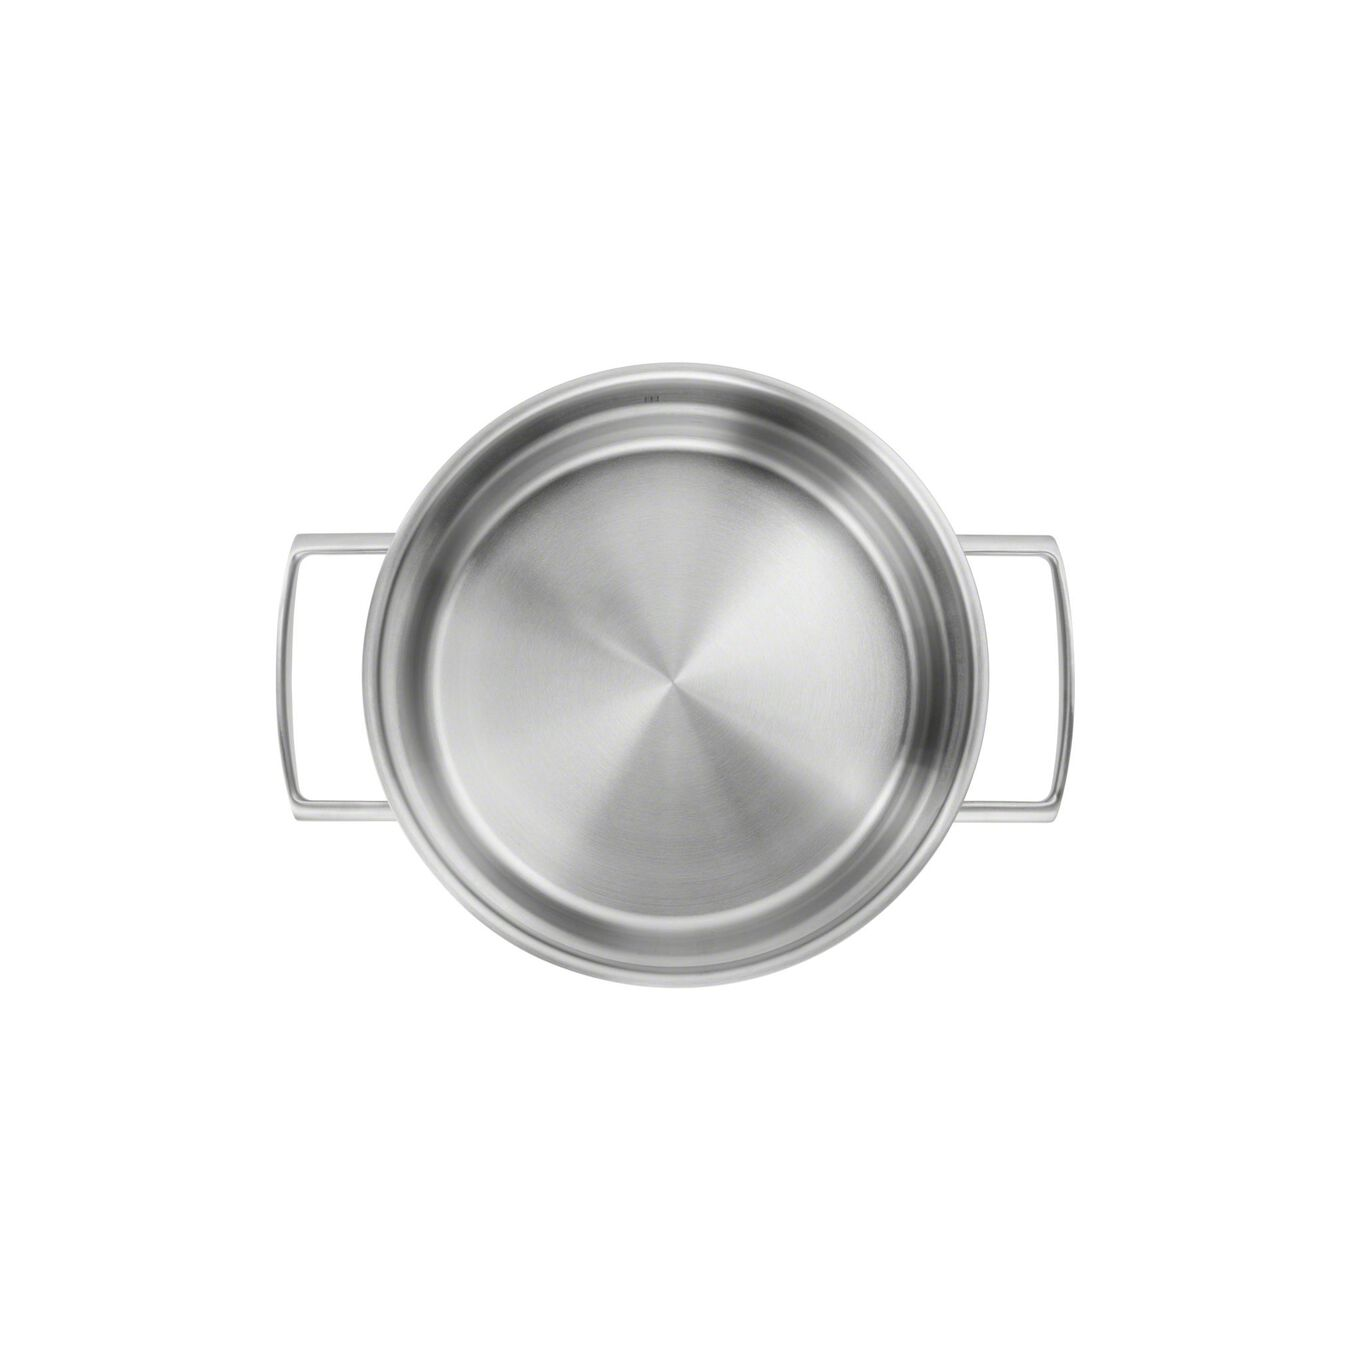 Tencere Seti | 18/10 Paslanmaz Çelik | 5-adet,,large 10